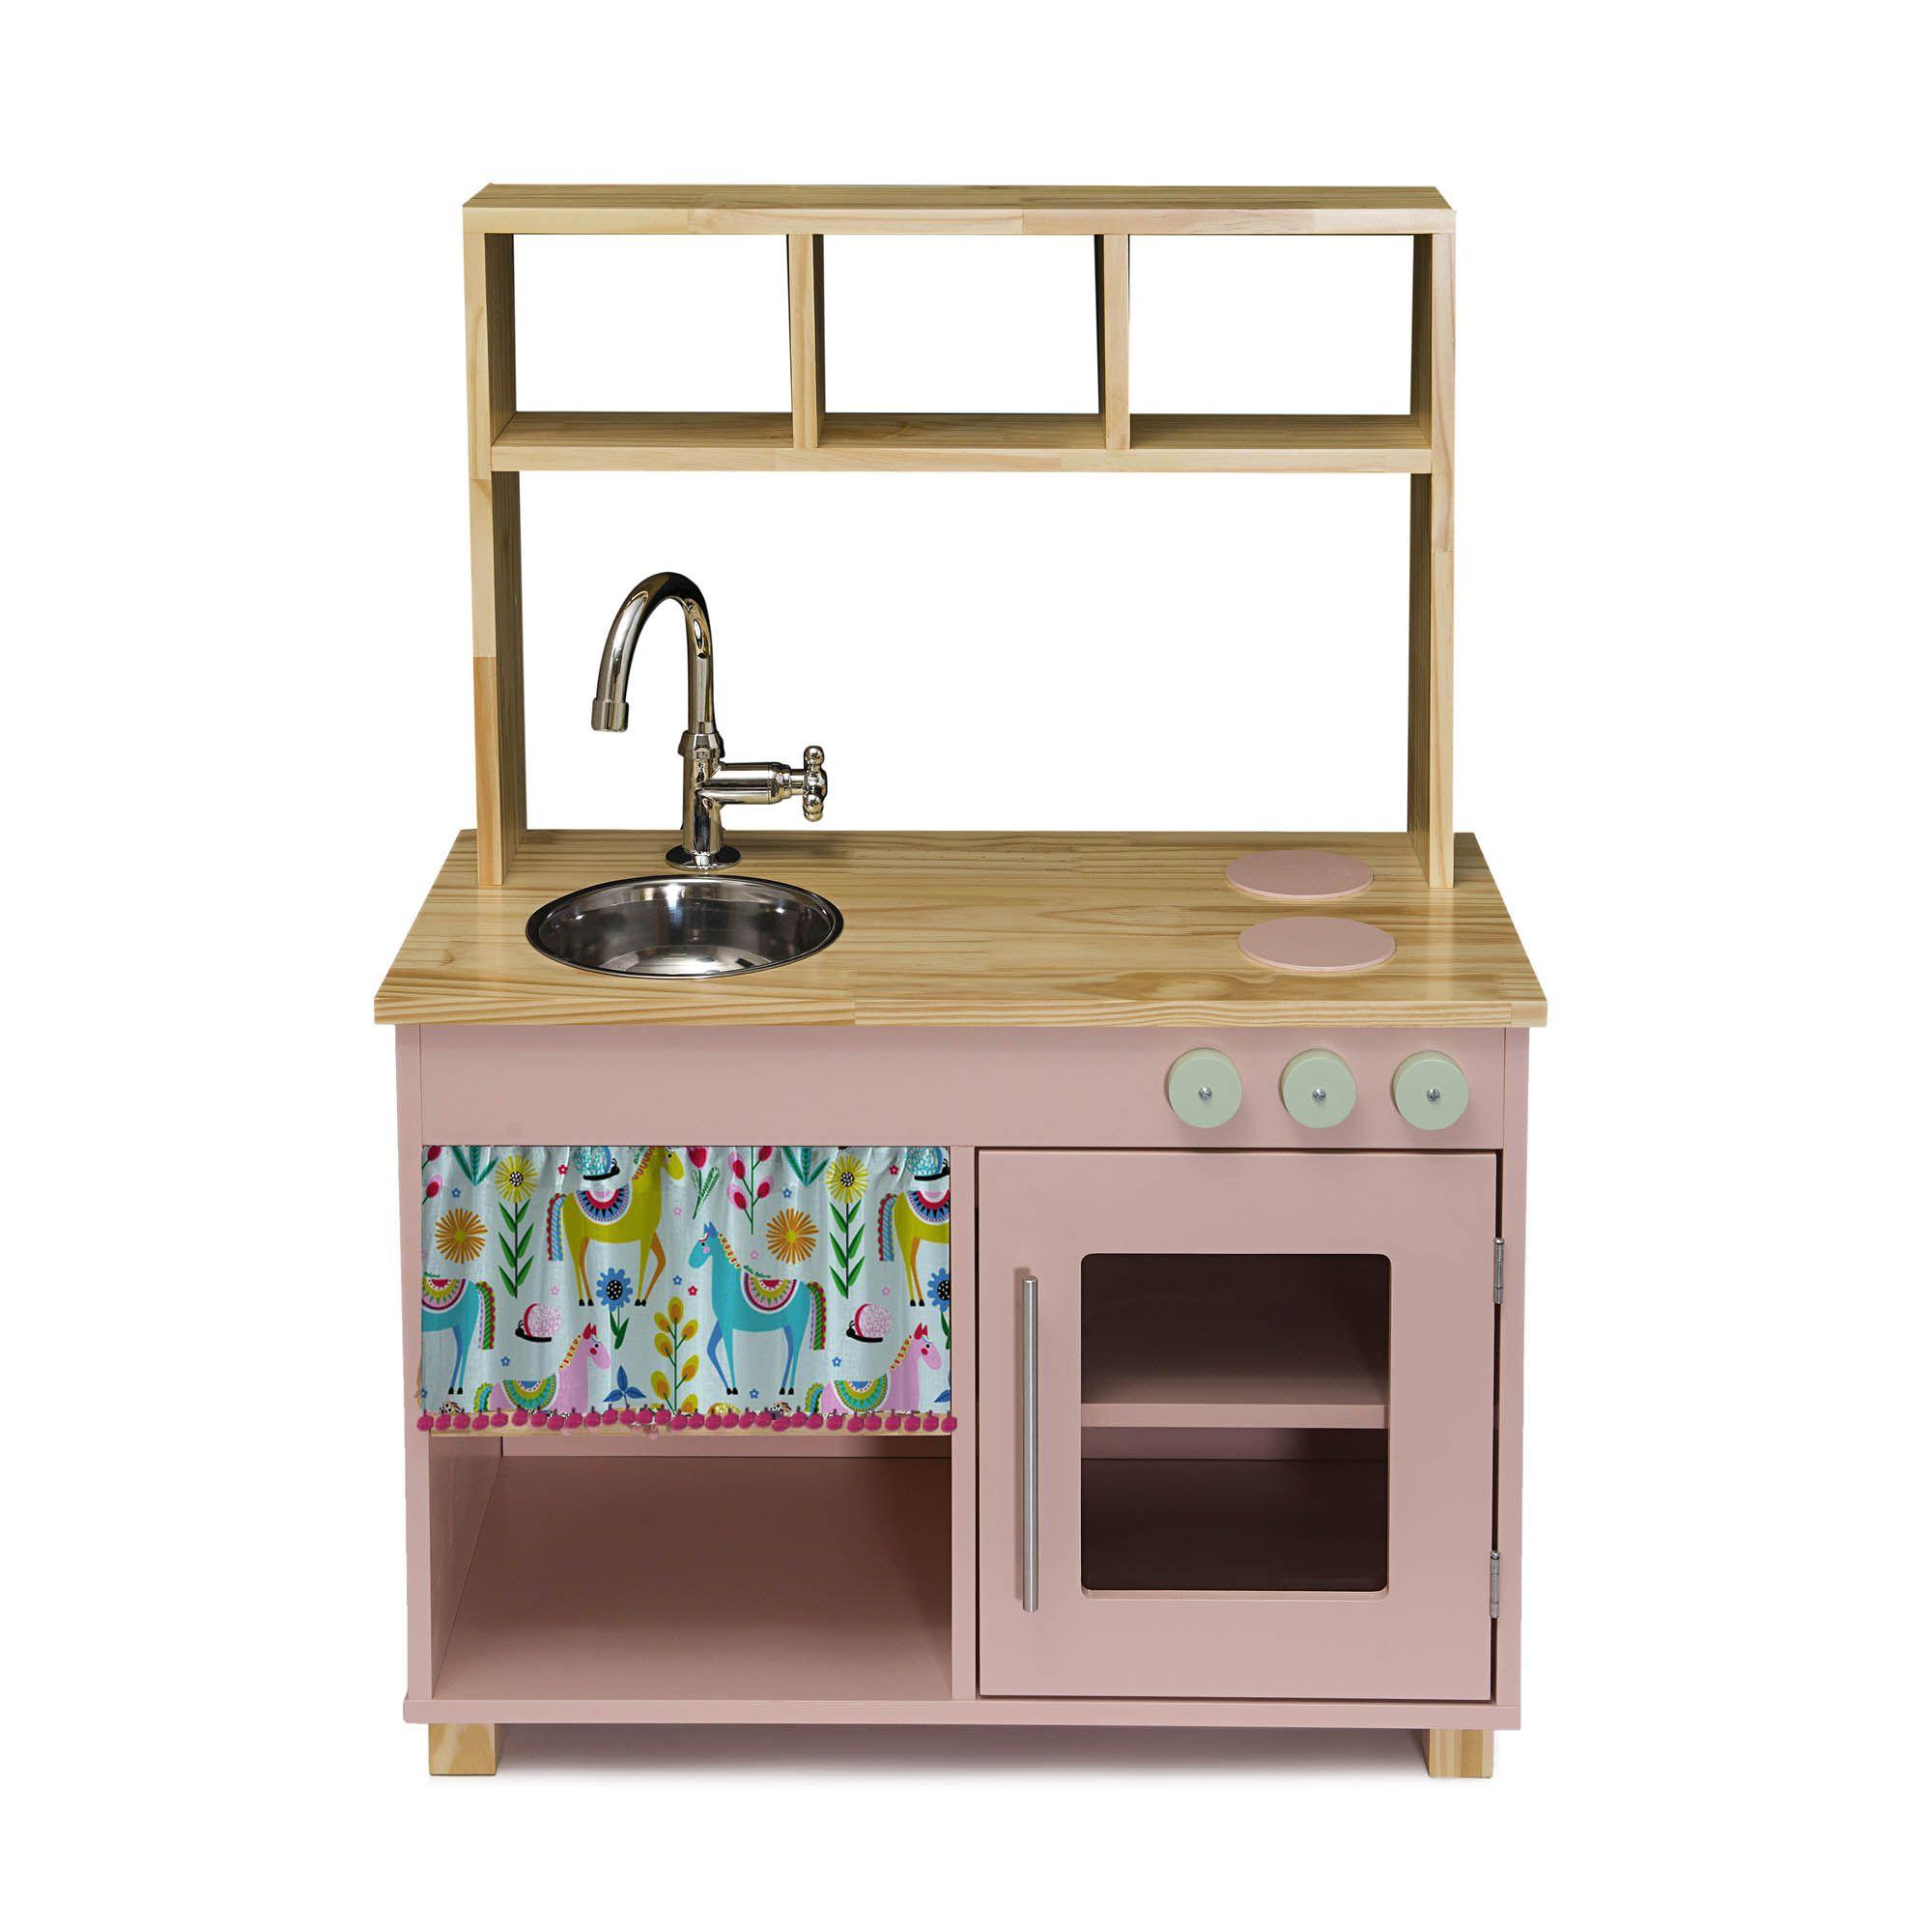 Cozinha Compacta Elis